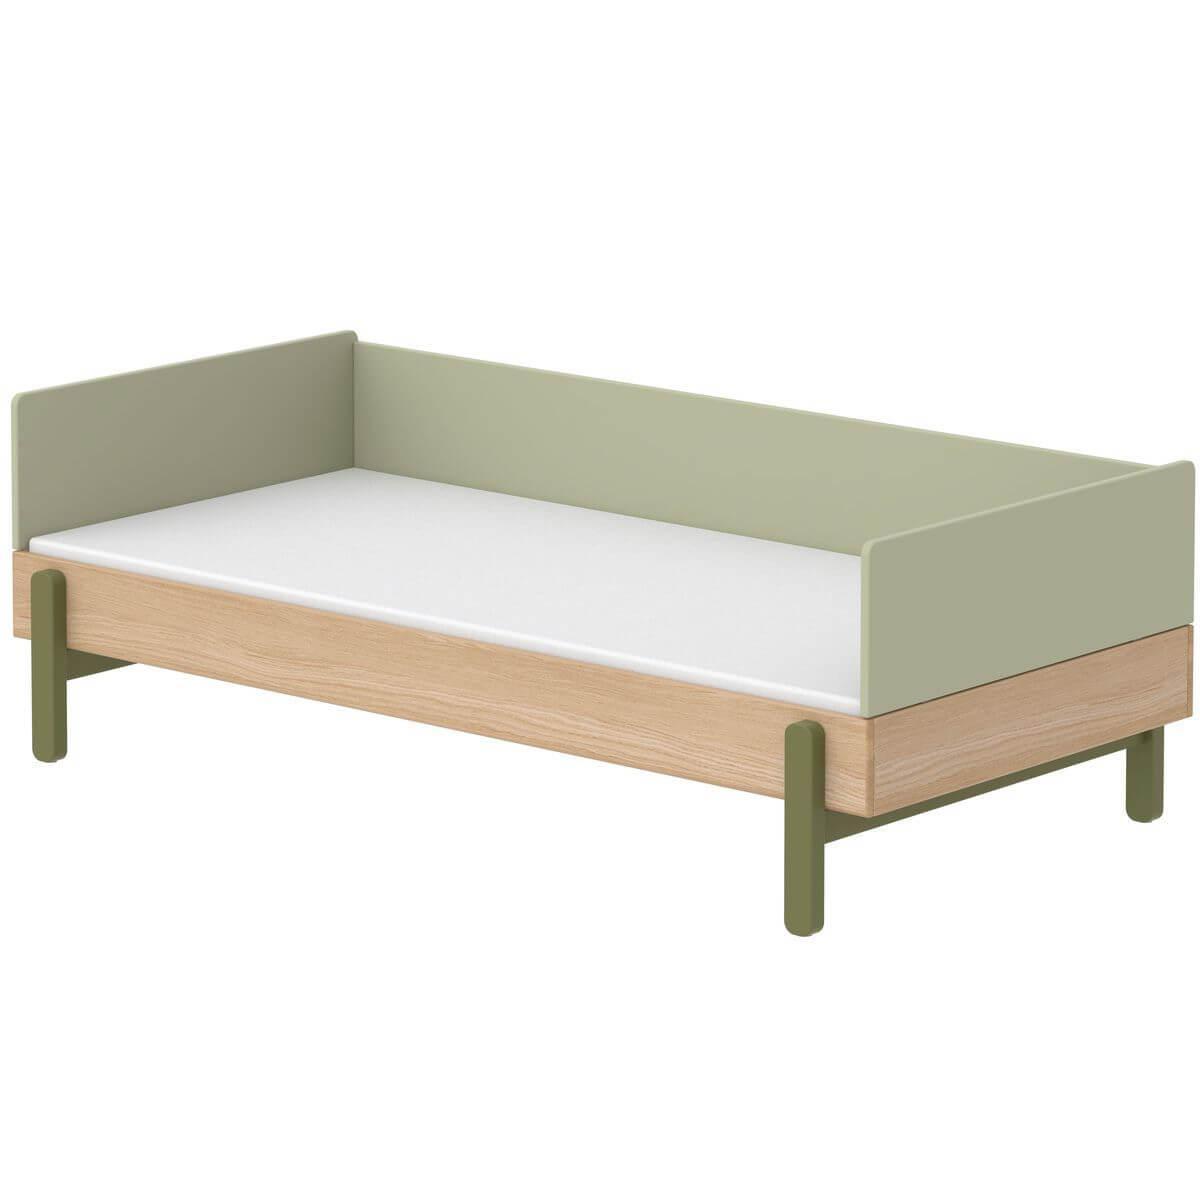 Cama-sofá 90x200cm POPSICLE Flexa roble-kiwi